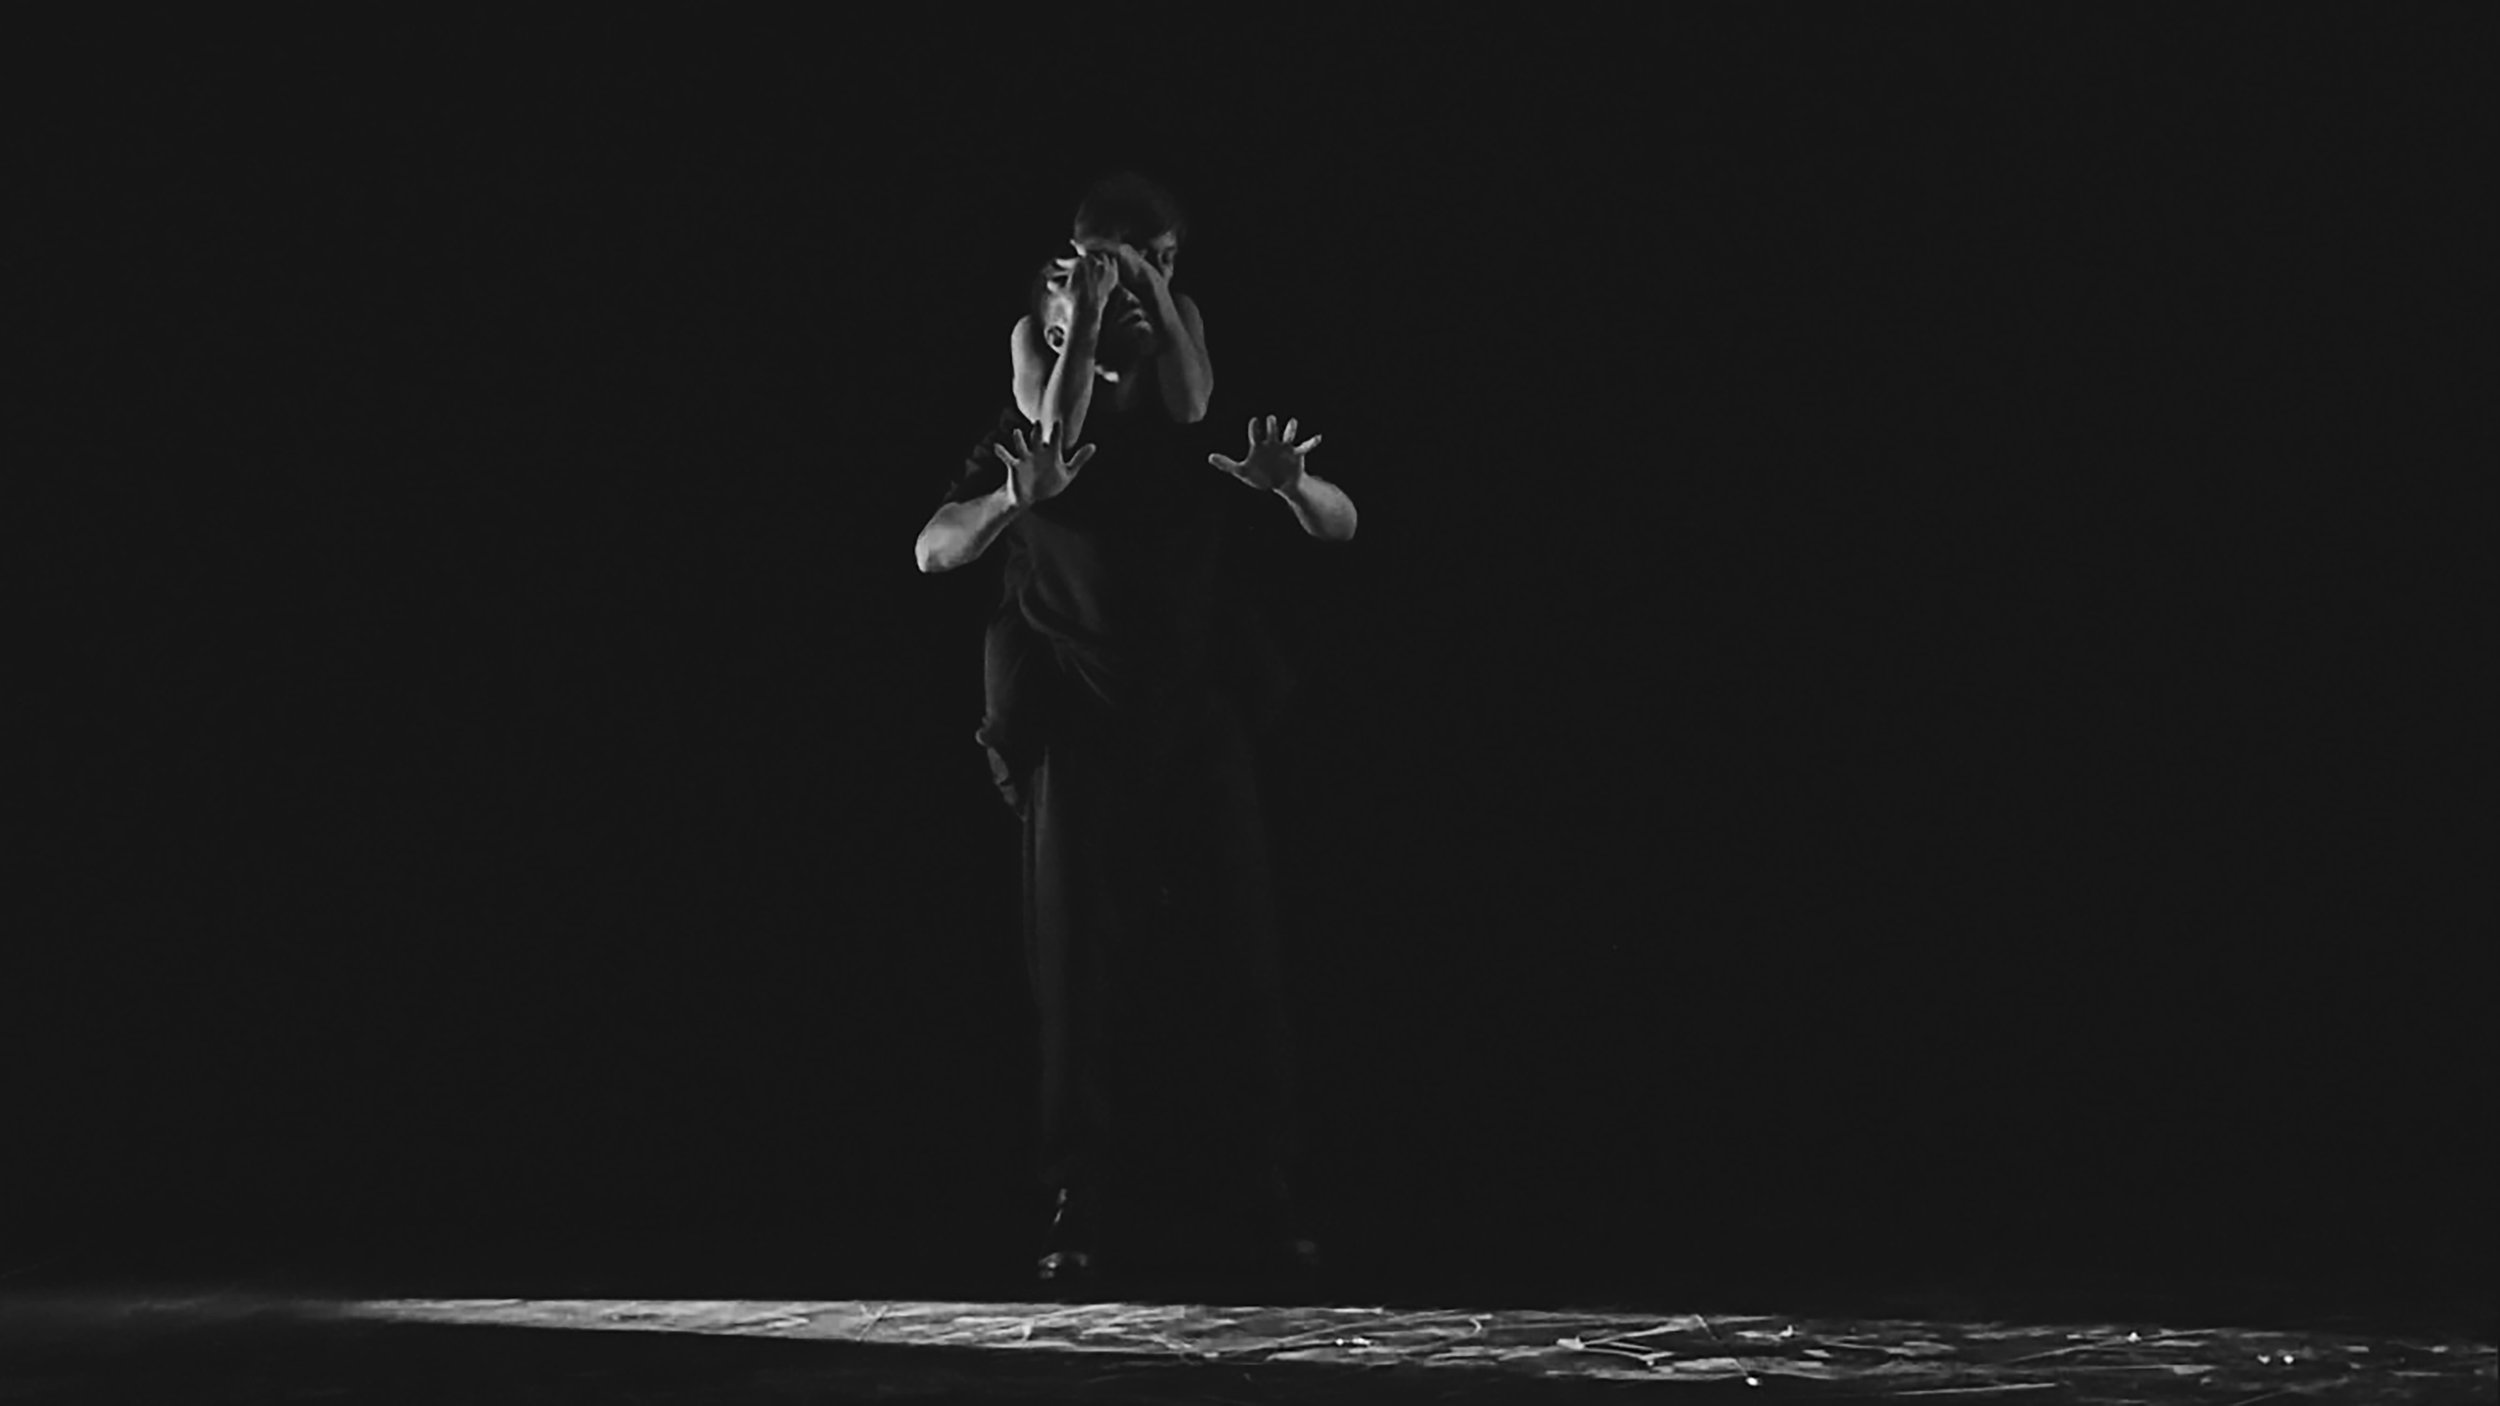 """[decoherence]"" (SummerWorks 2016)  Jessie Garon - VAZARI DANCE PROJECTS  Photo by Francesca Chudnoff"